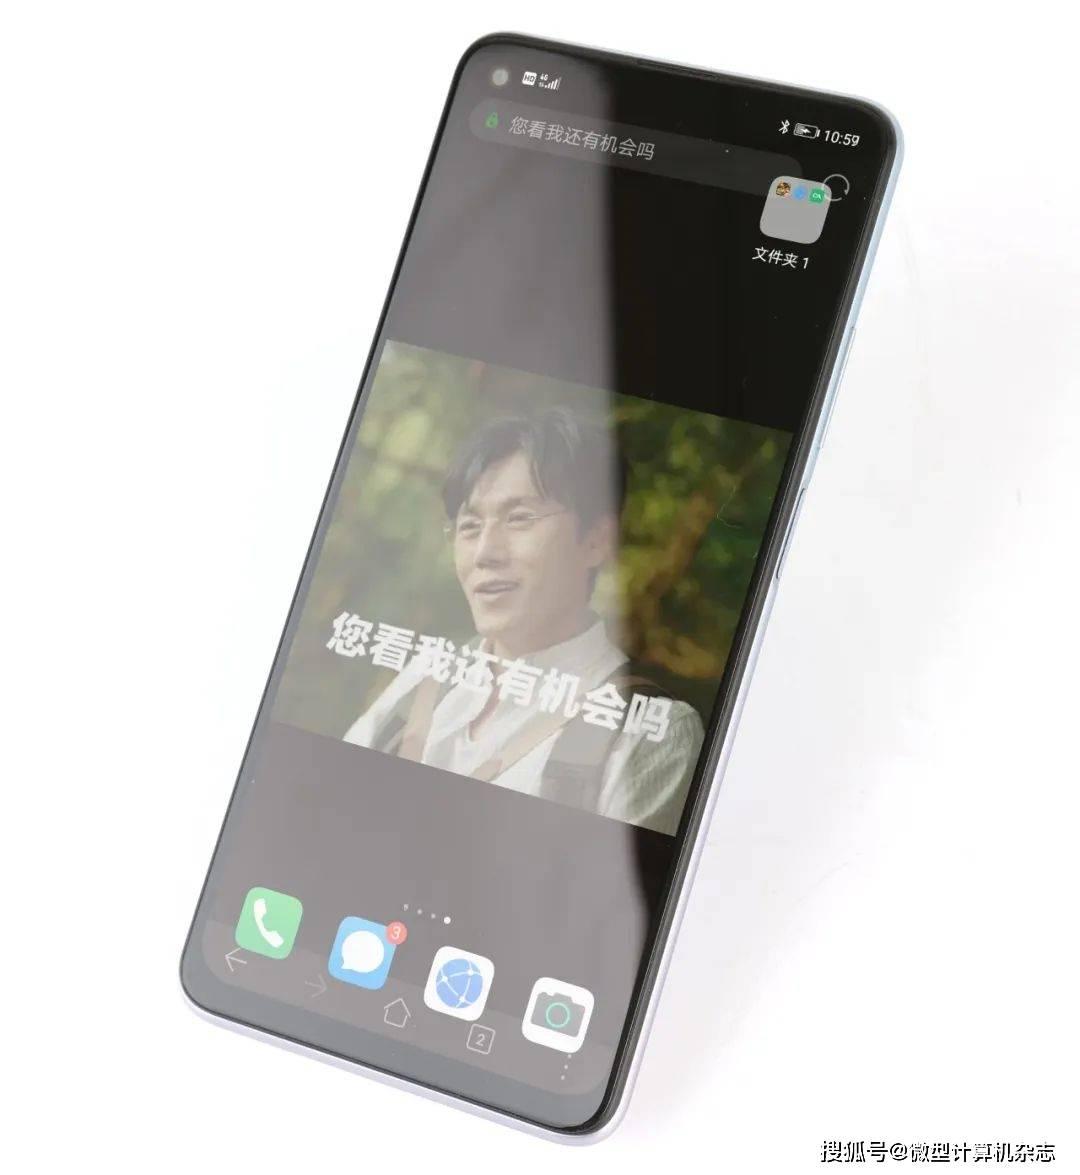 5G手机价格普遍太高?荣耀Play4:您看我还有机会吗?